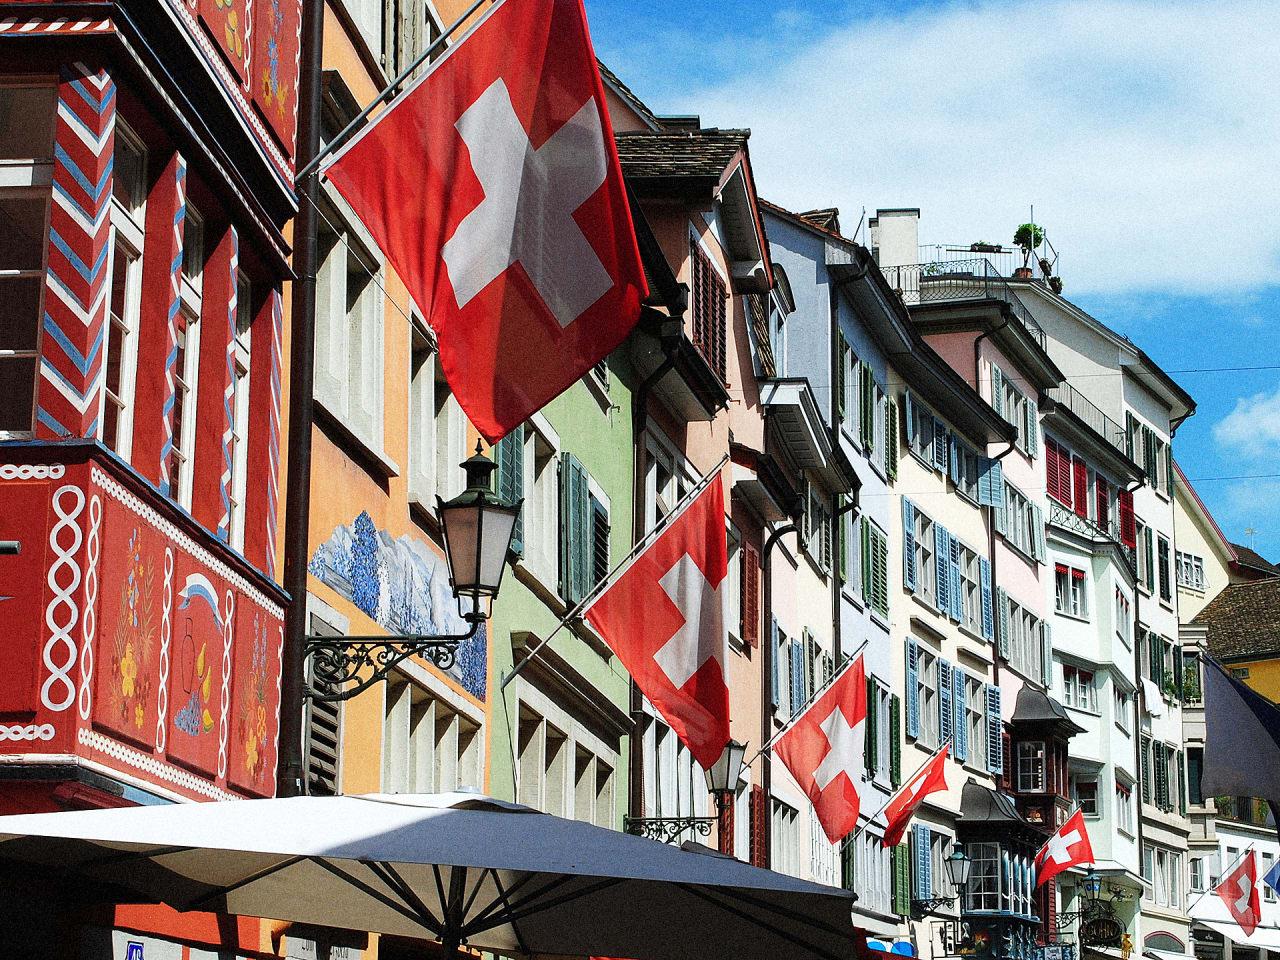 Best Fast Food In Switzerland